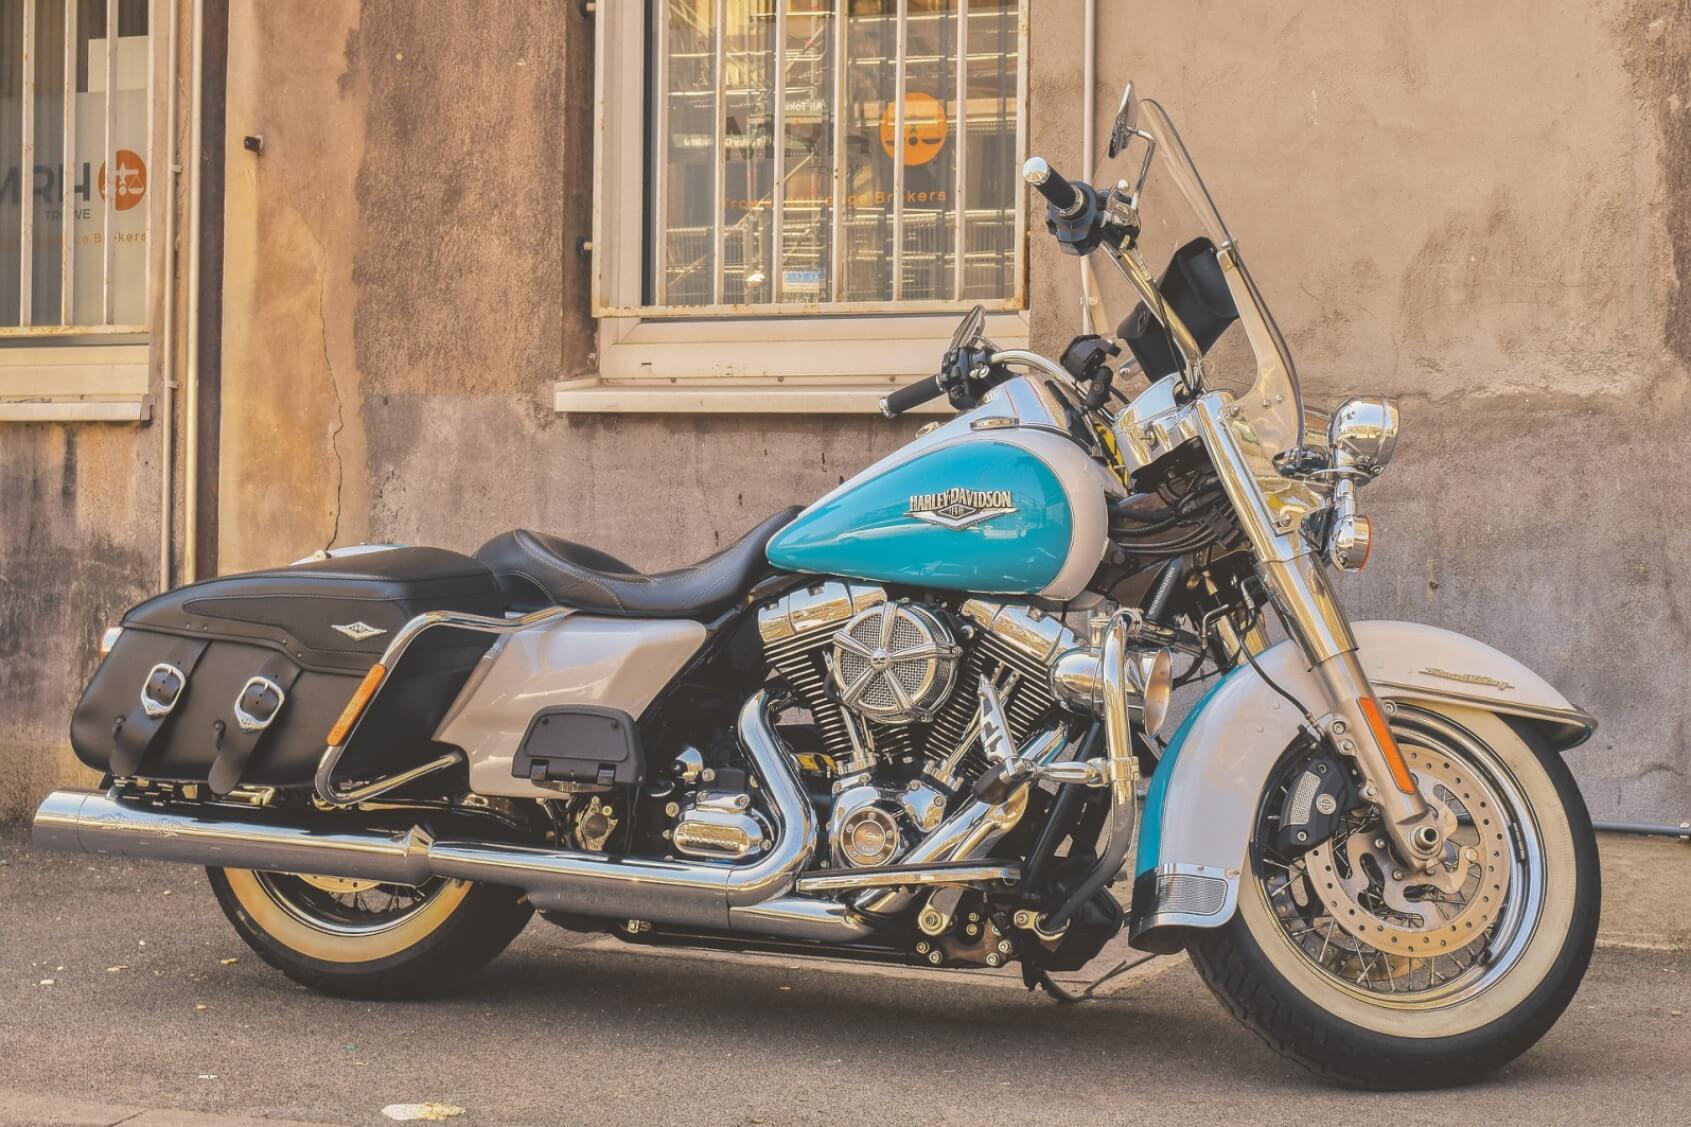 Harley Davidson Road Cruiser - Original image